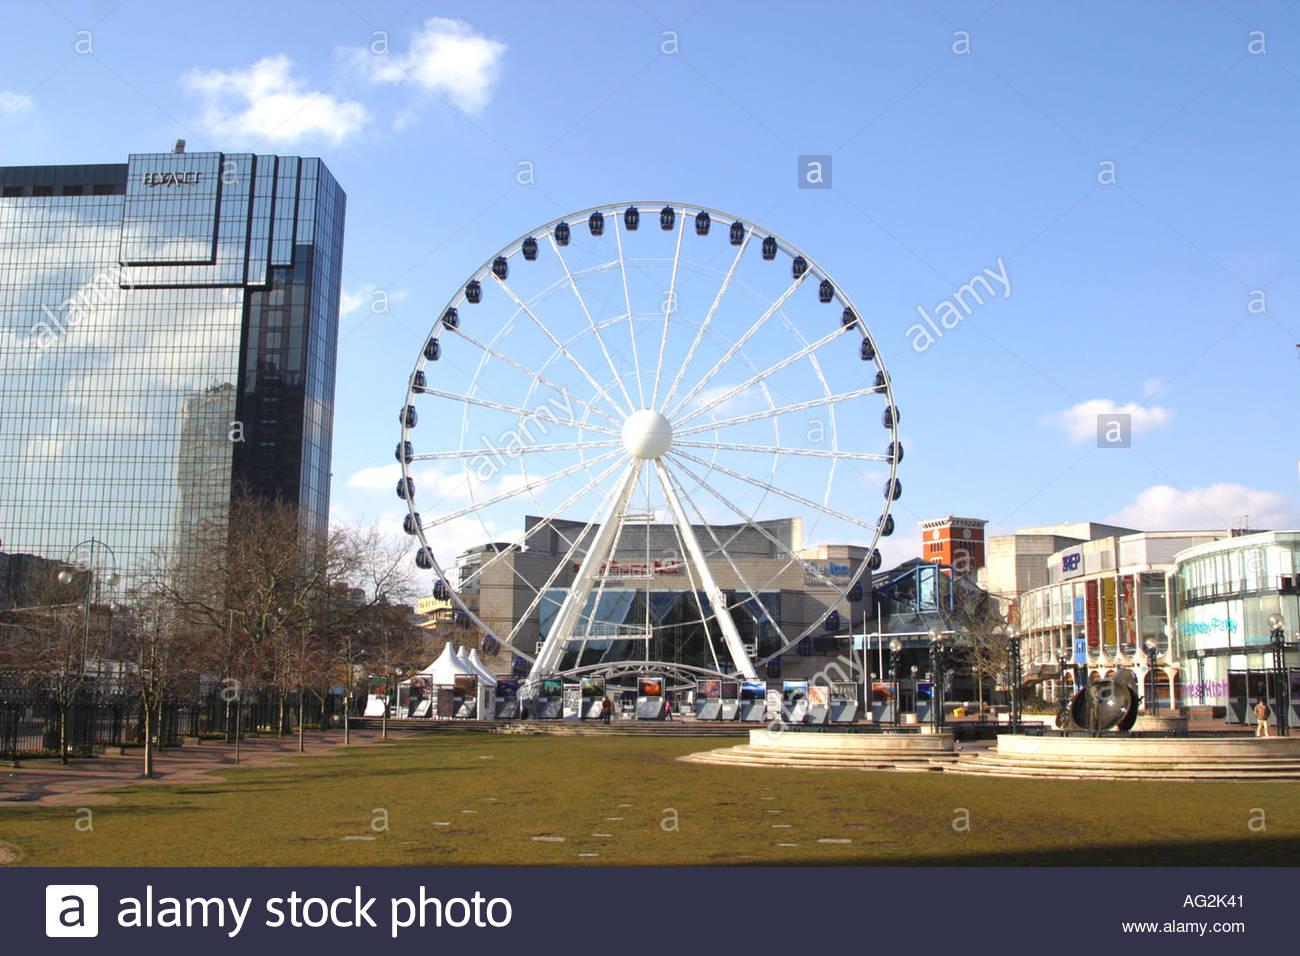 Birmingham eye hyatt hotel - Stock Image